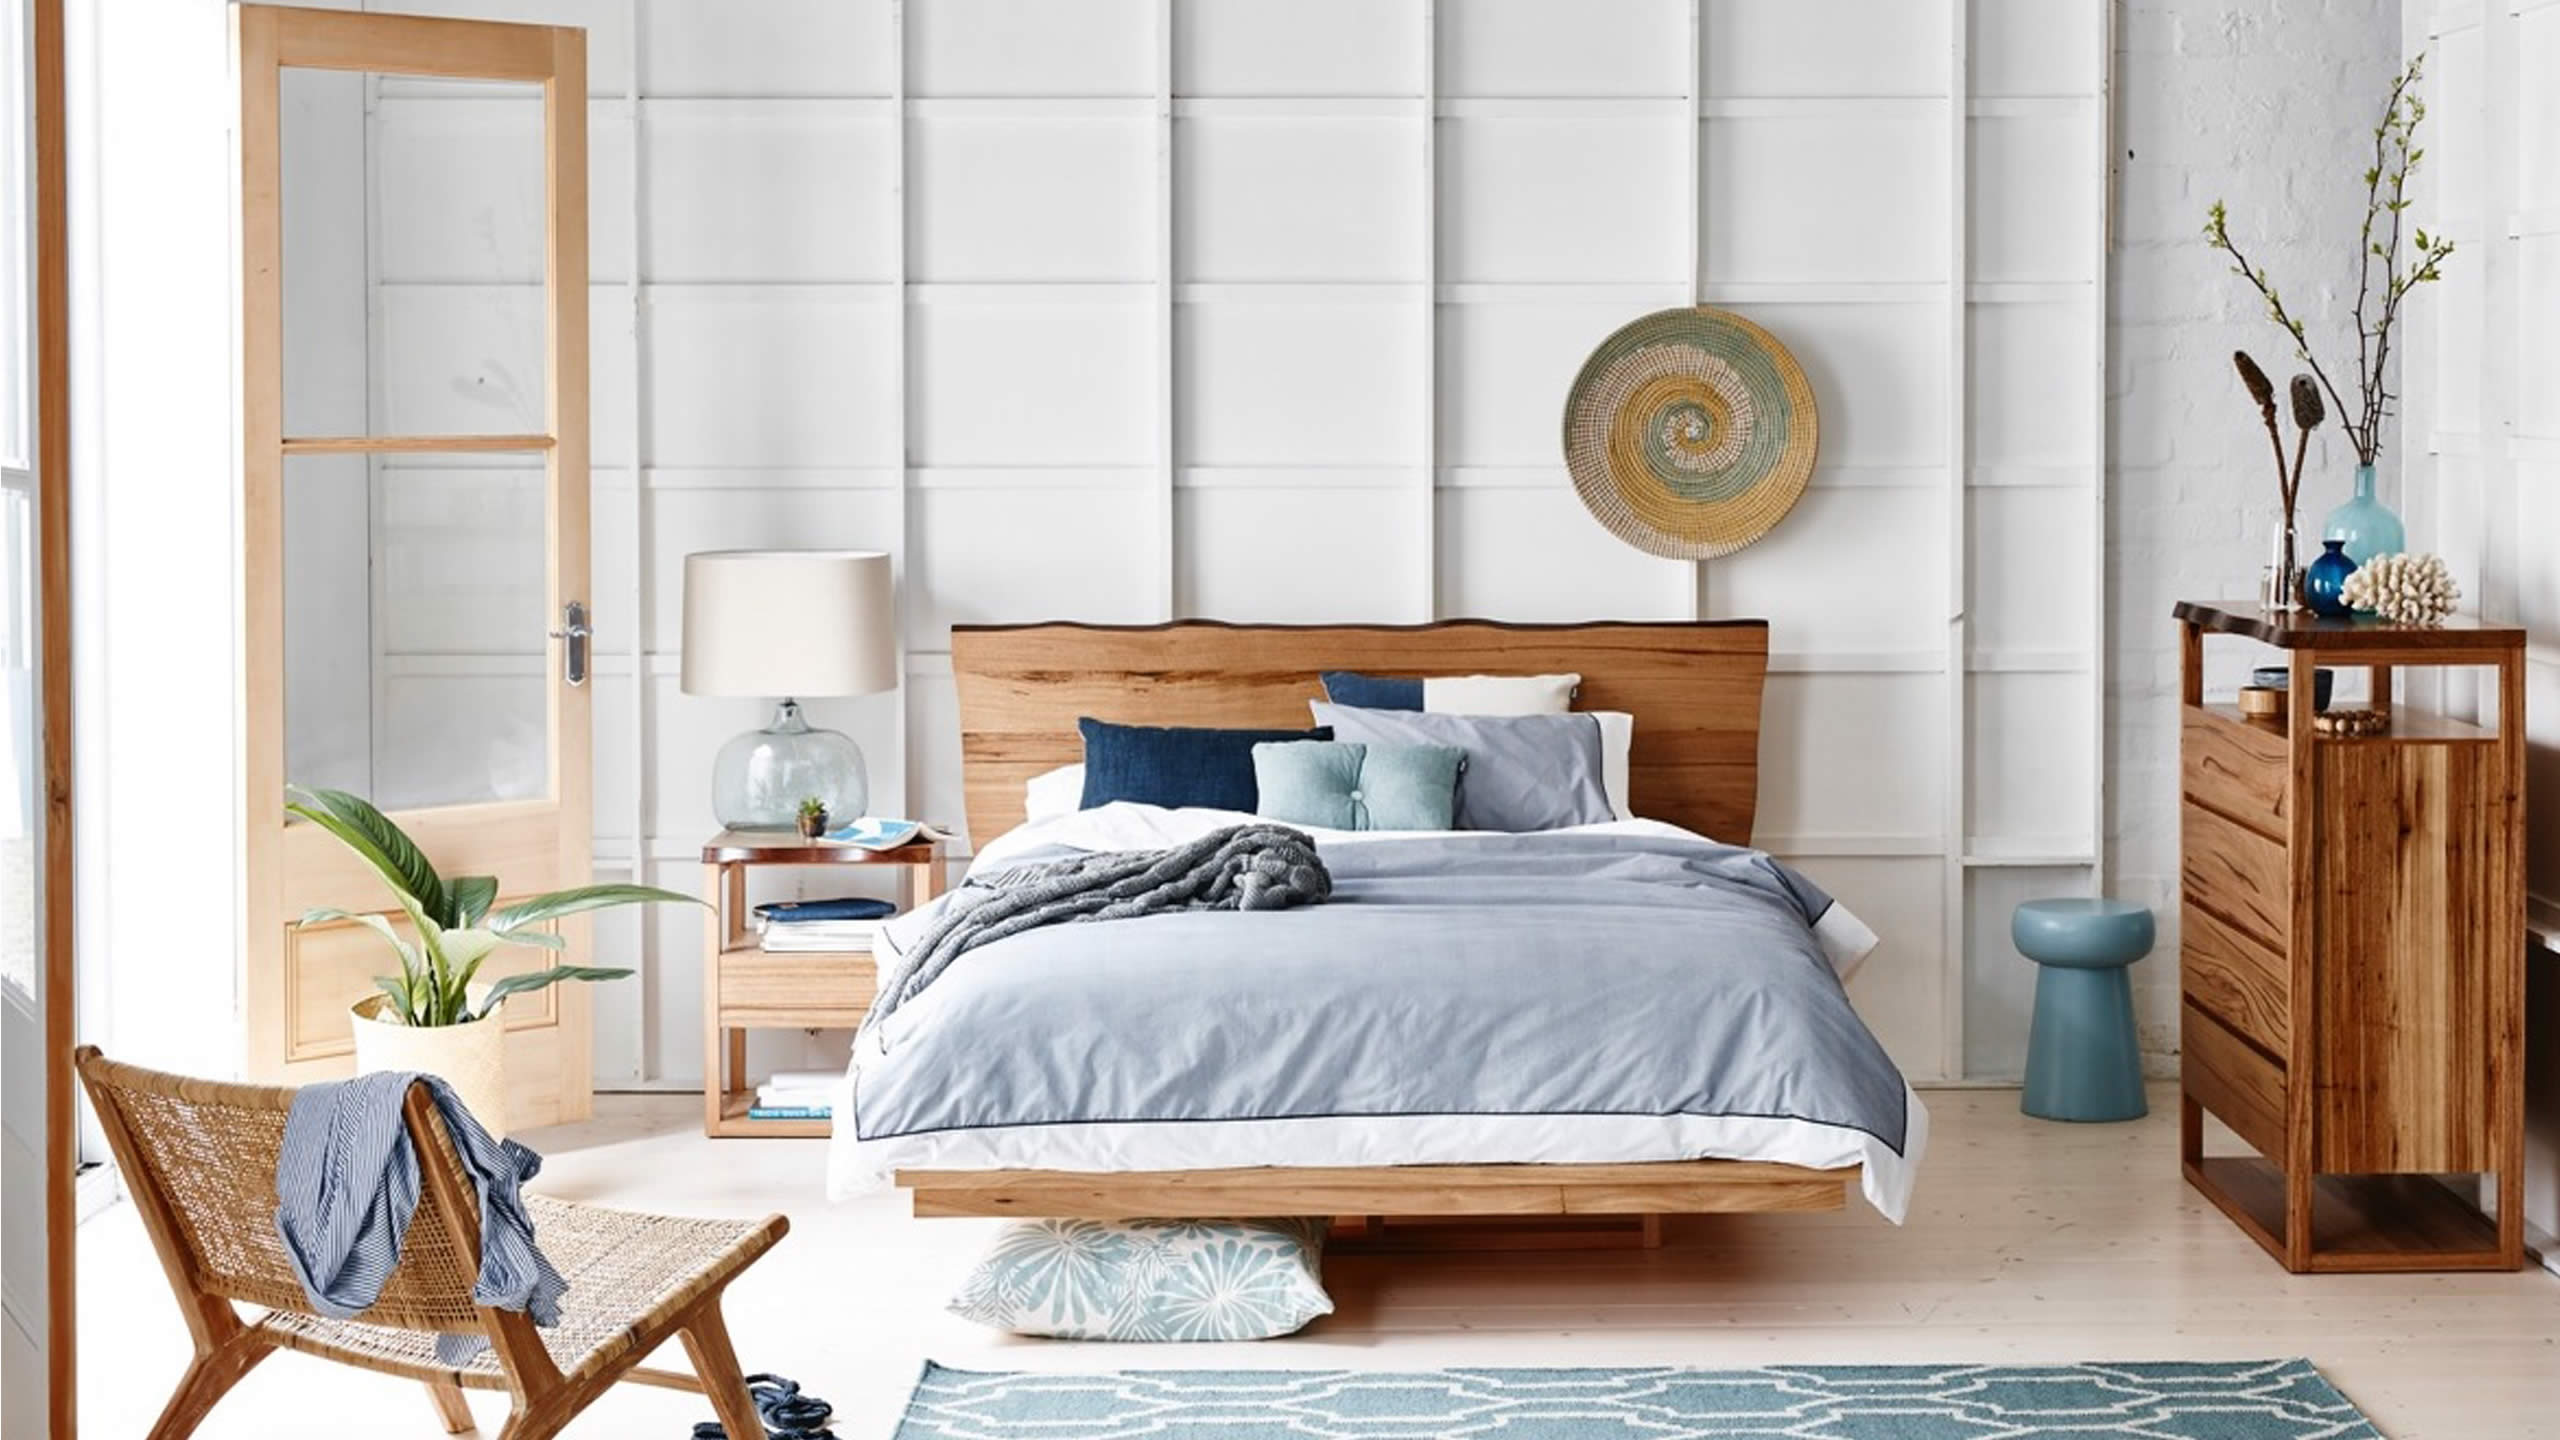 Home Flexiwood High Quality Australian Made Timber Furniture